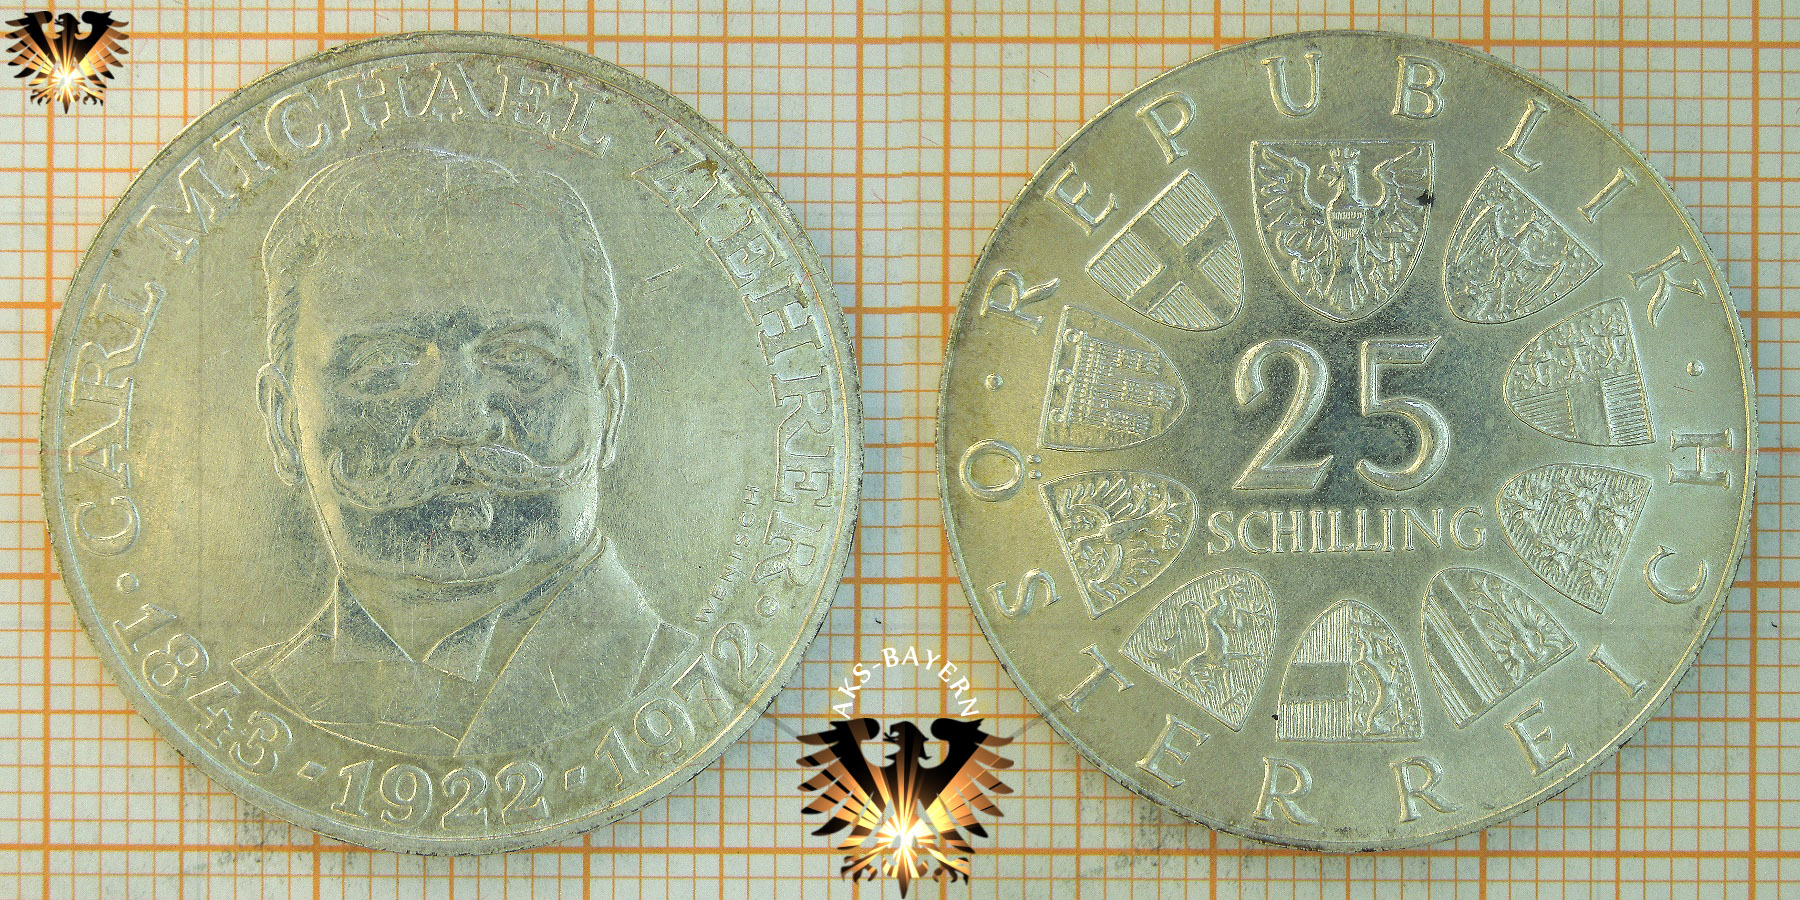 Ii Republik österreich Münzkatalog Goldmünzen Silbermünzen